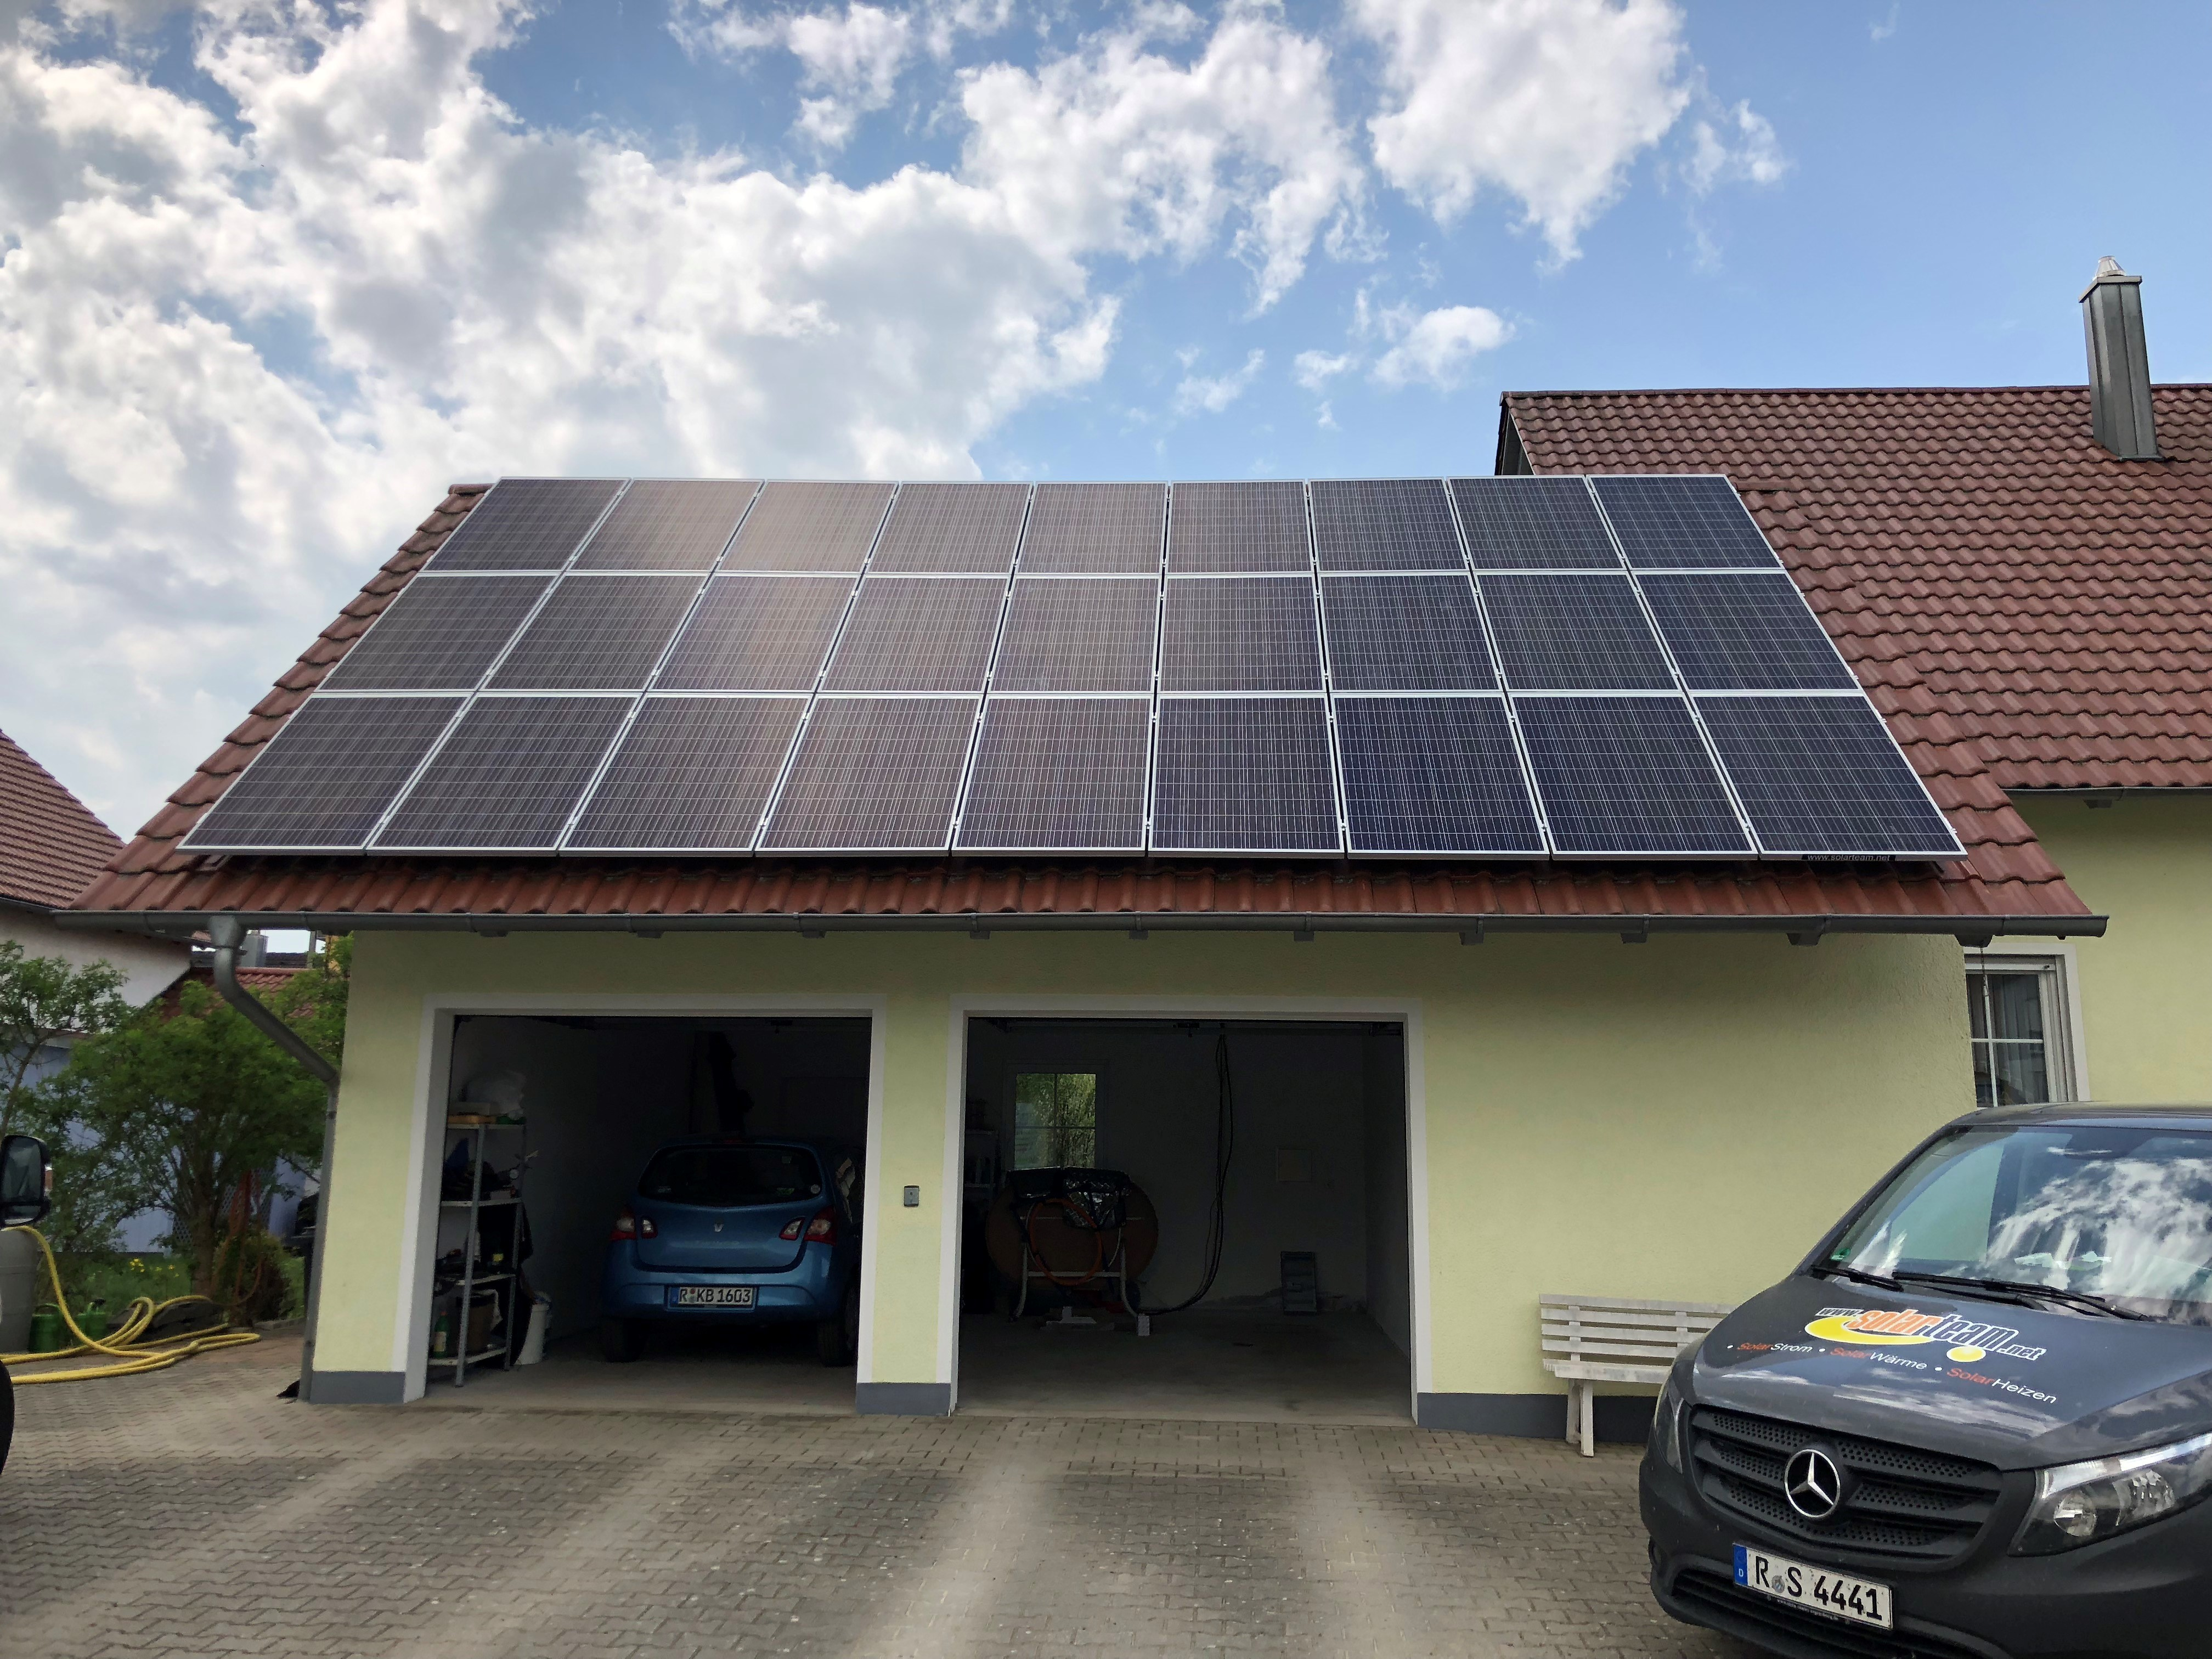 Photovoltaik-Anlagenbau